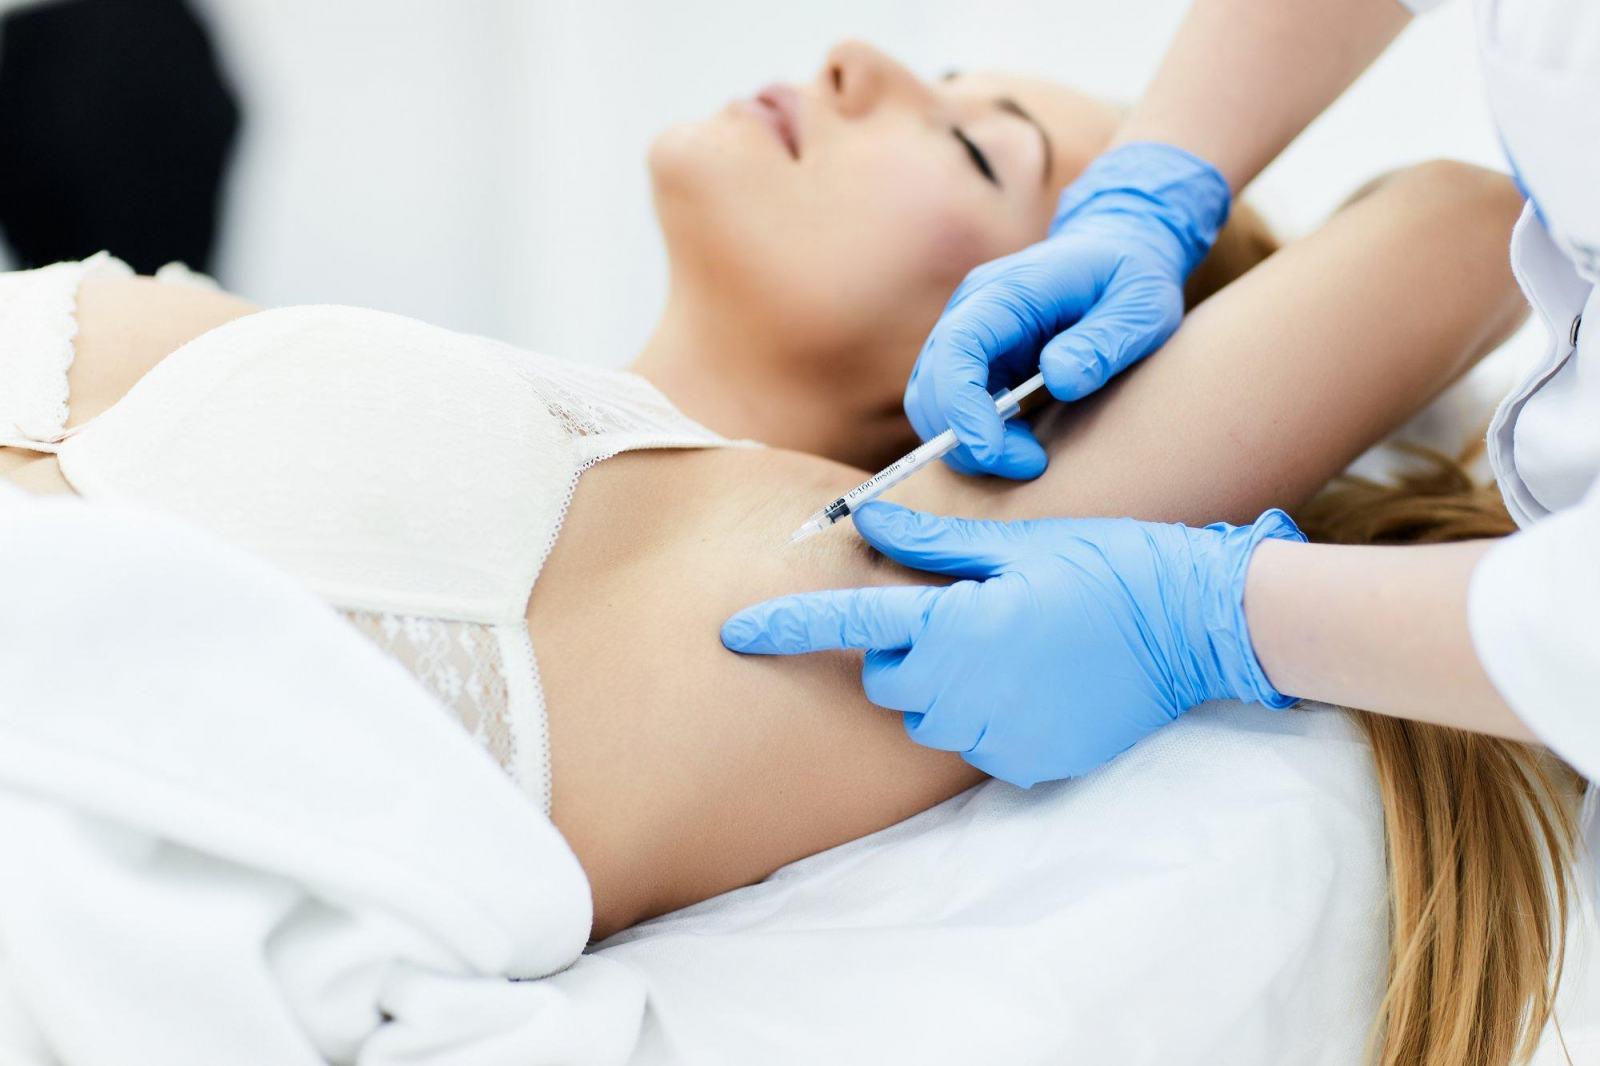 Лечат ли гипергидроз ботоксом?